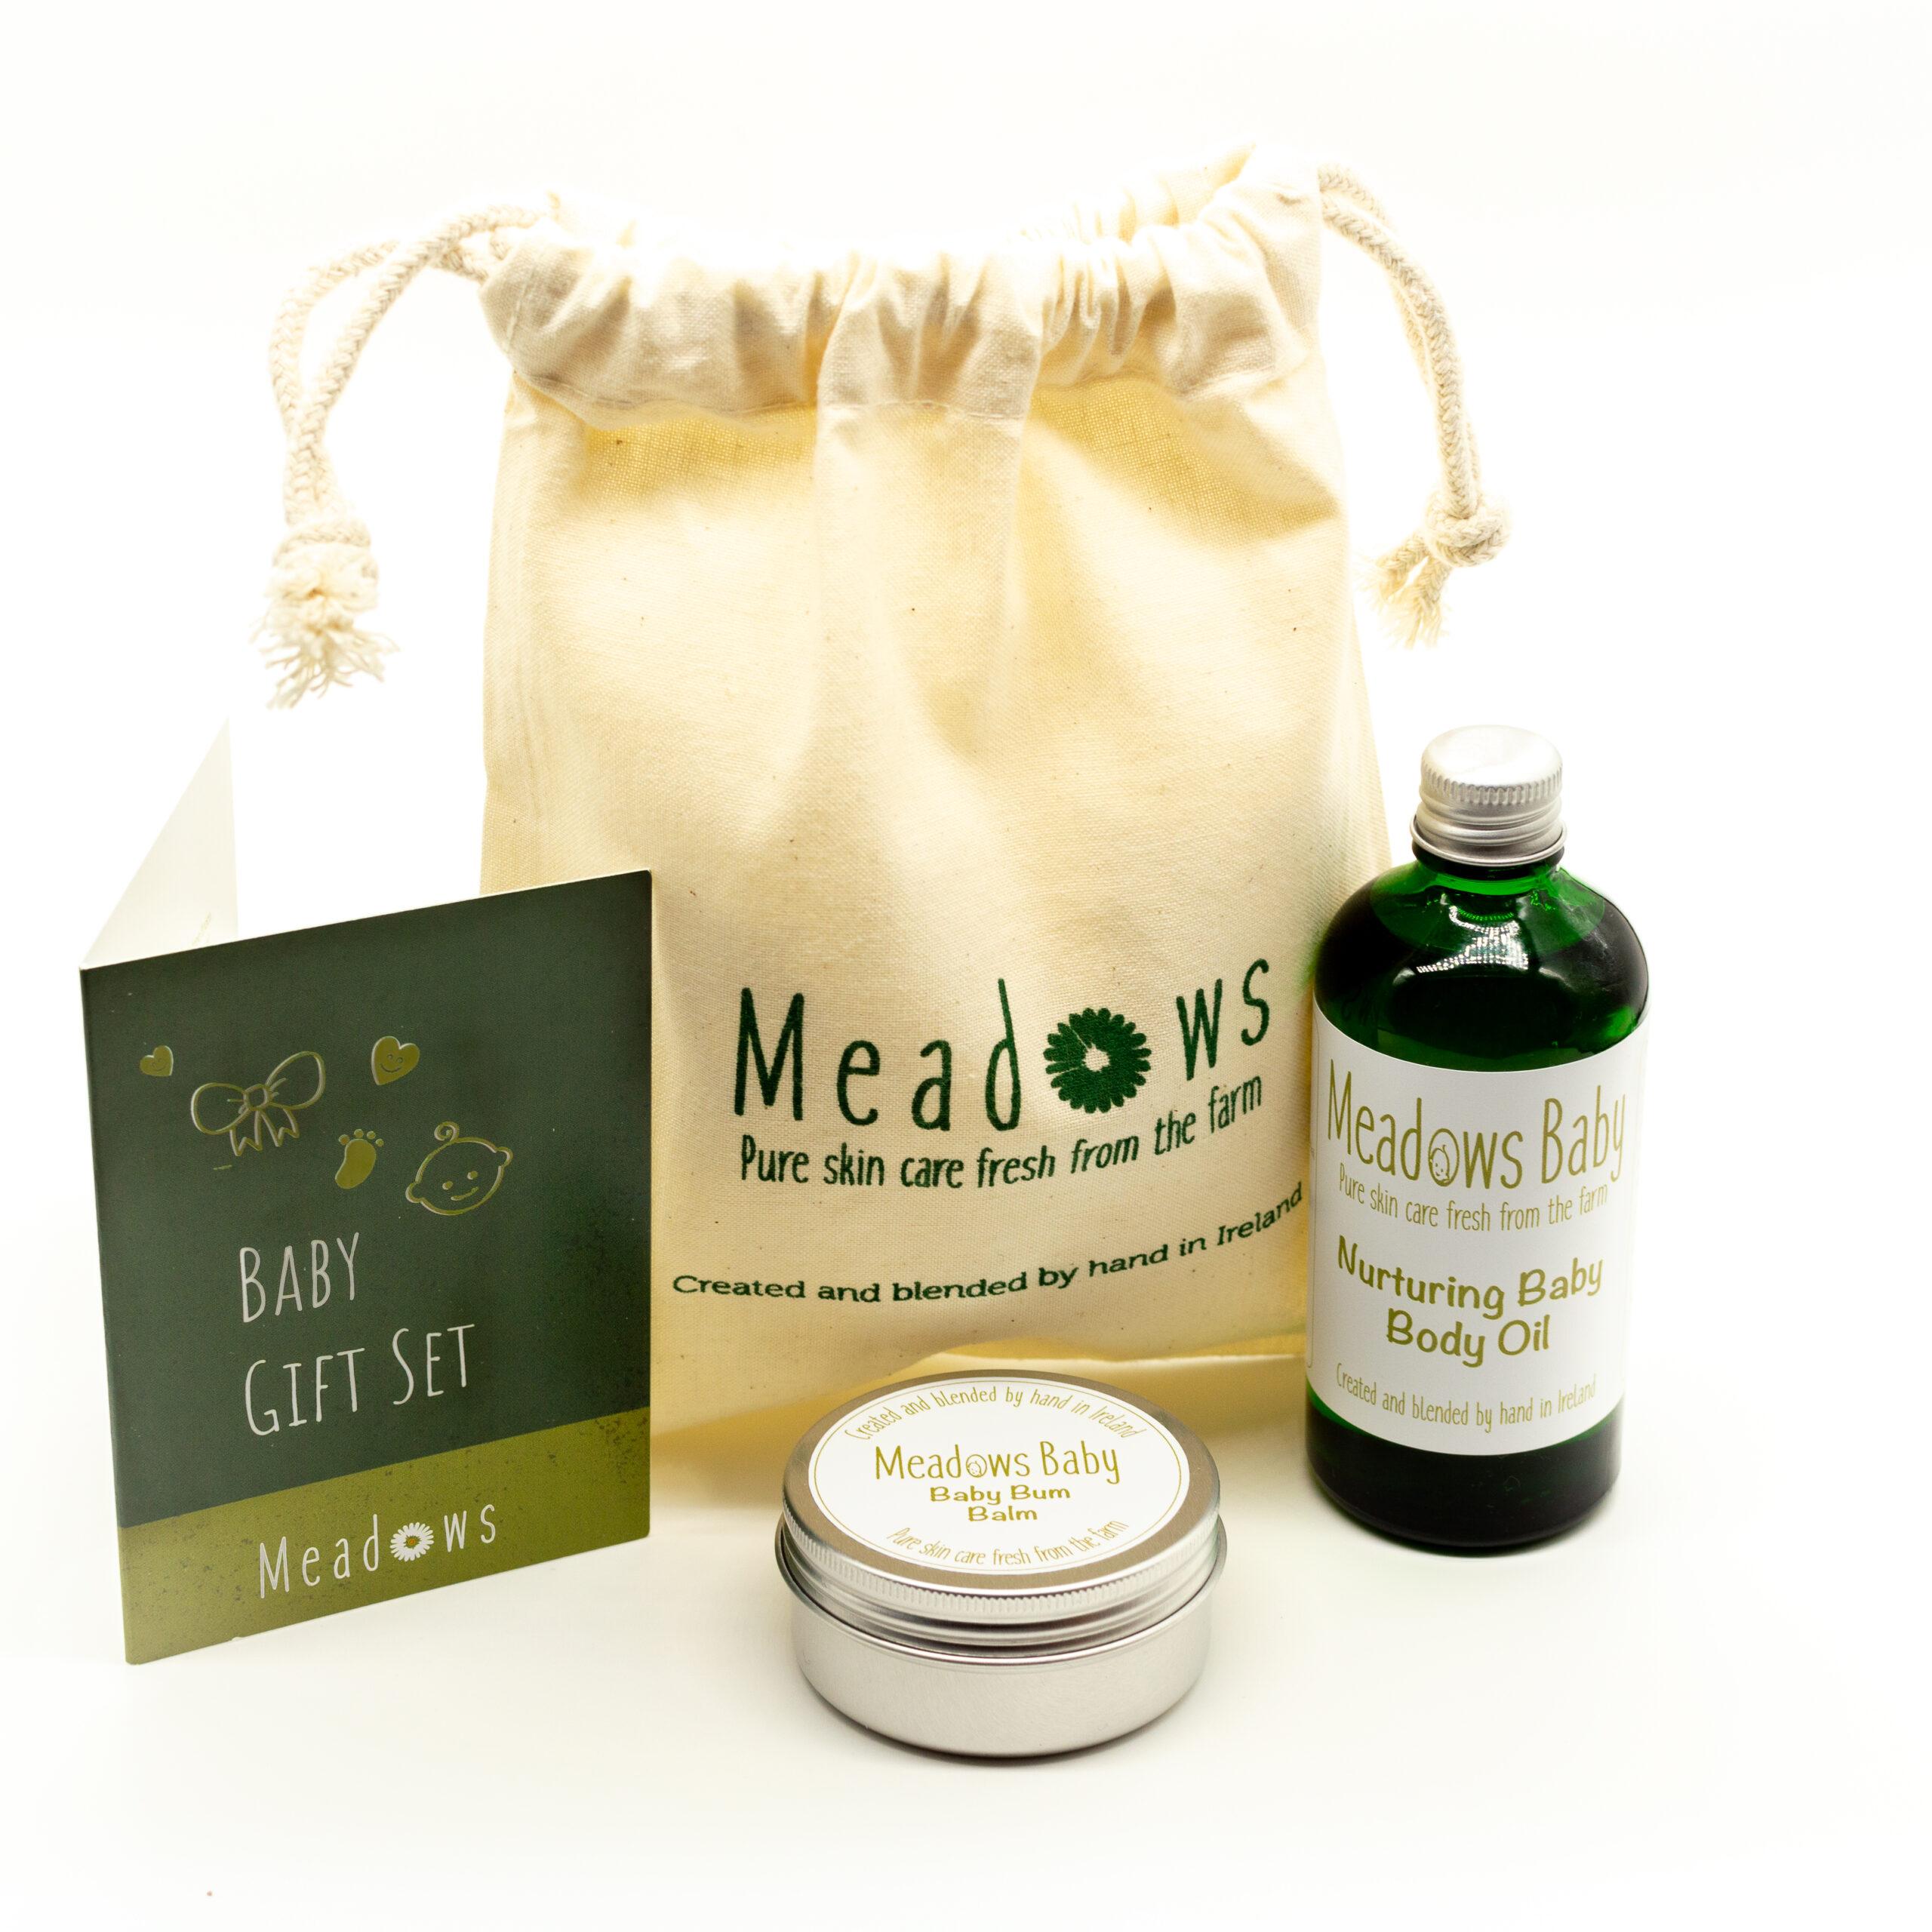 Meadows Baby Skin Care Gift Set Meadows